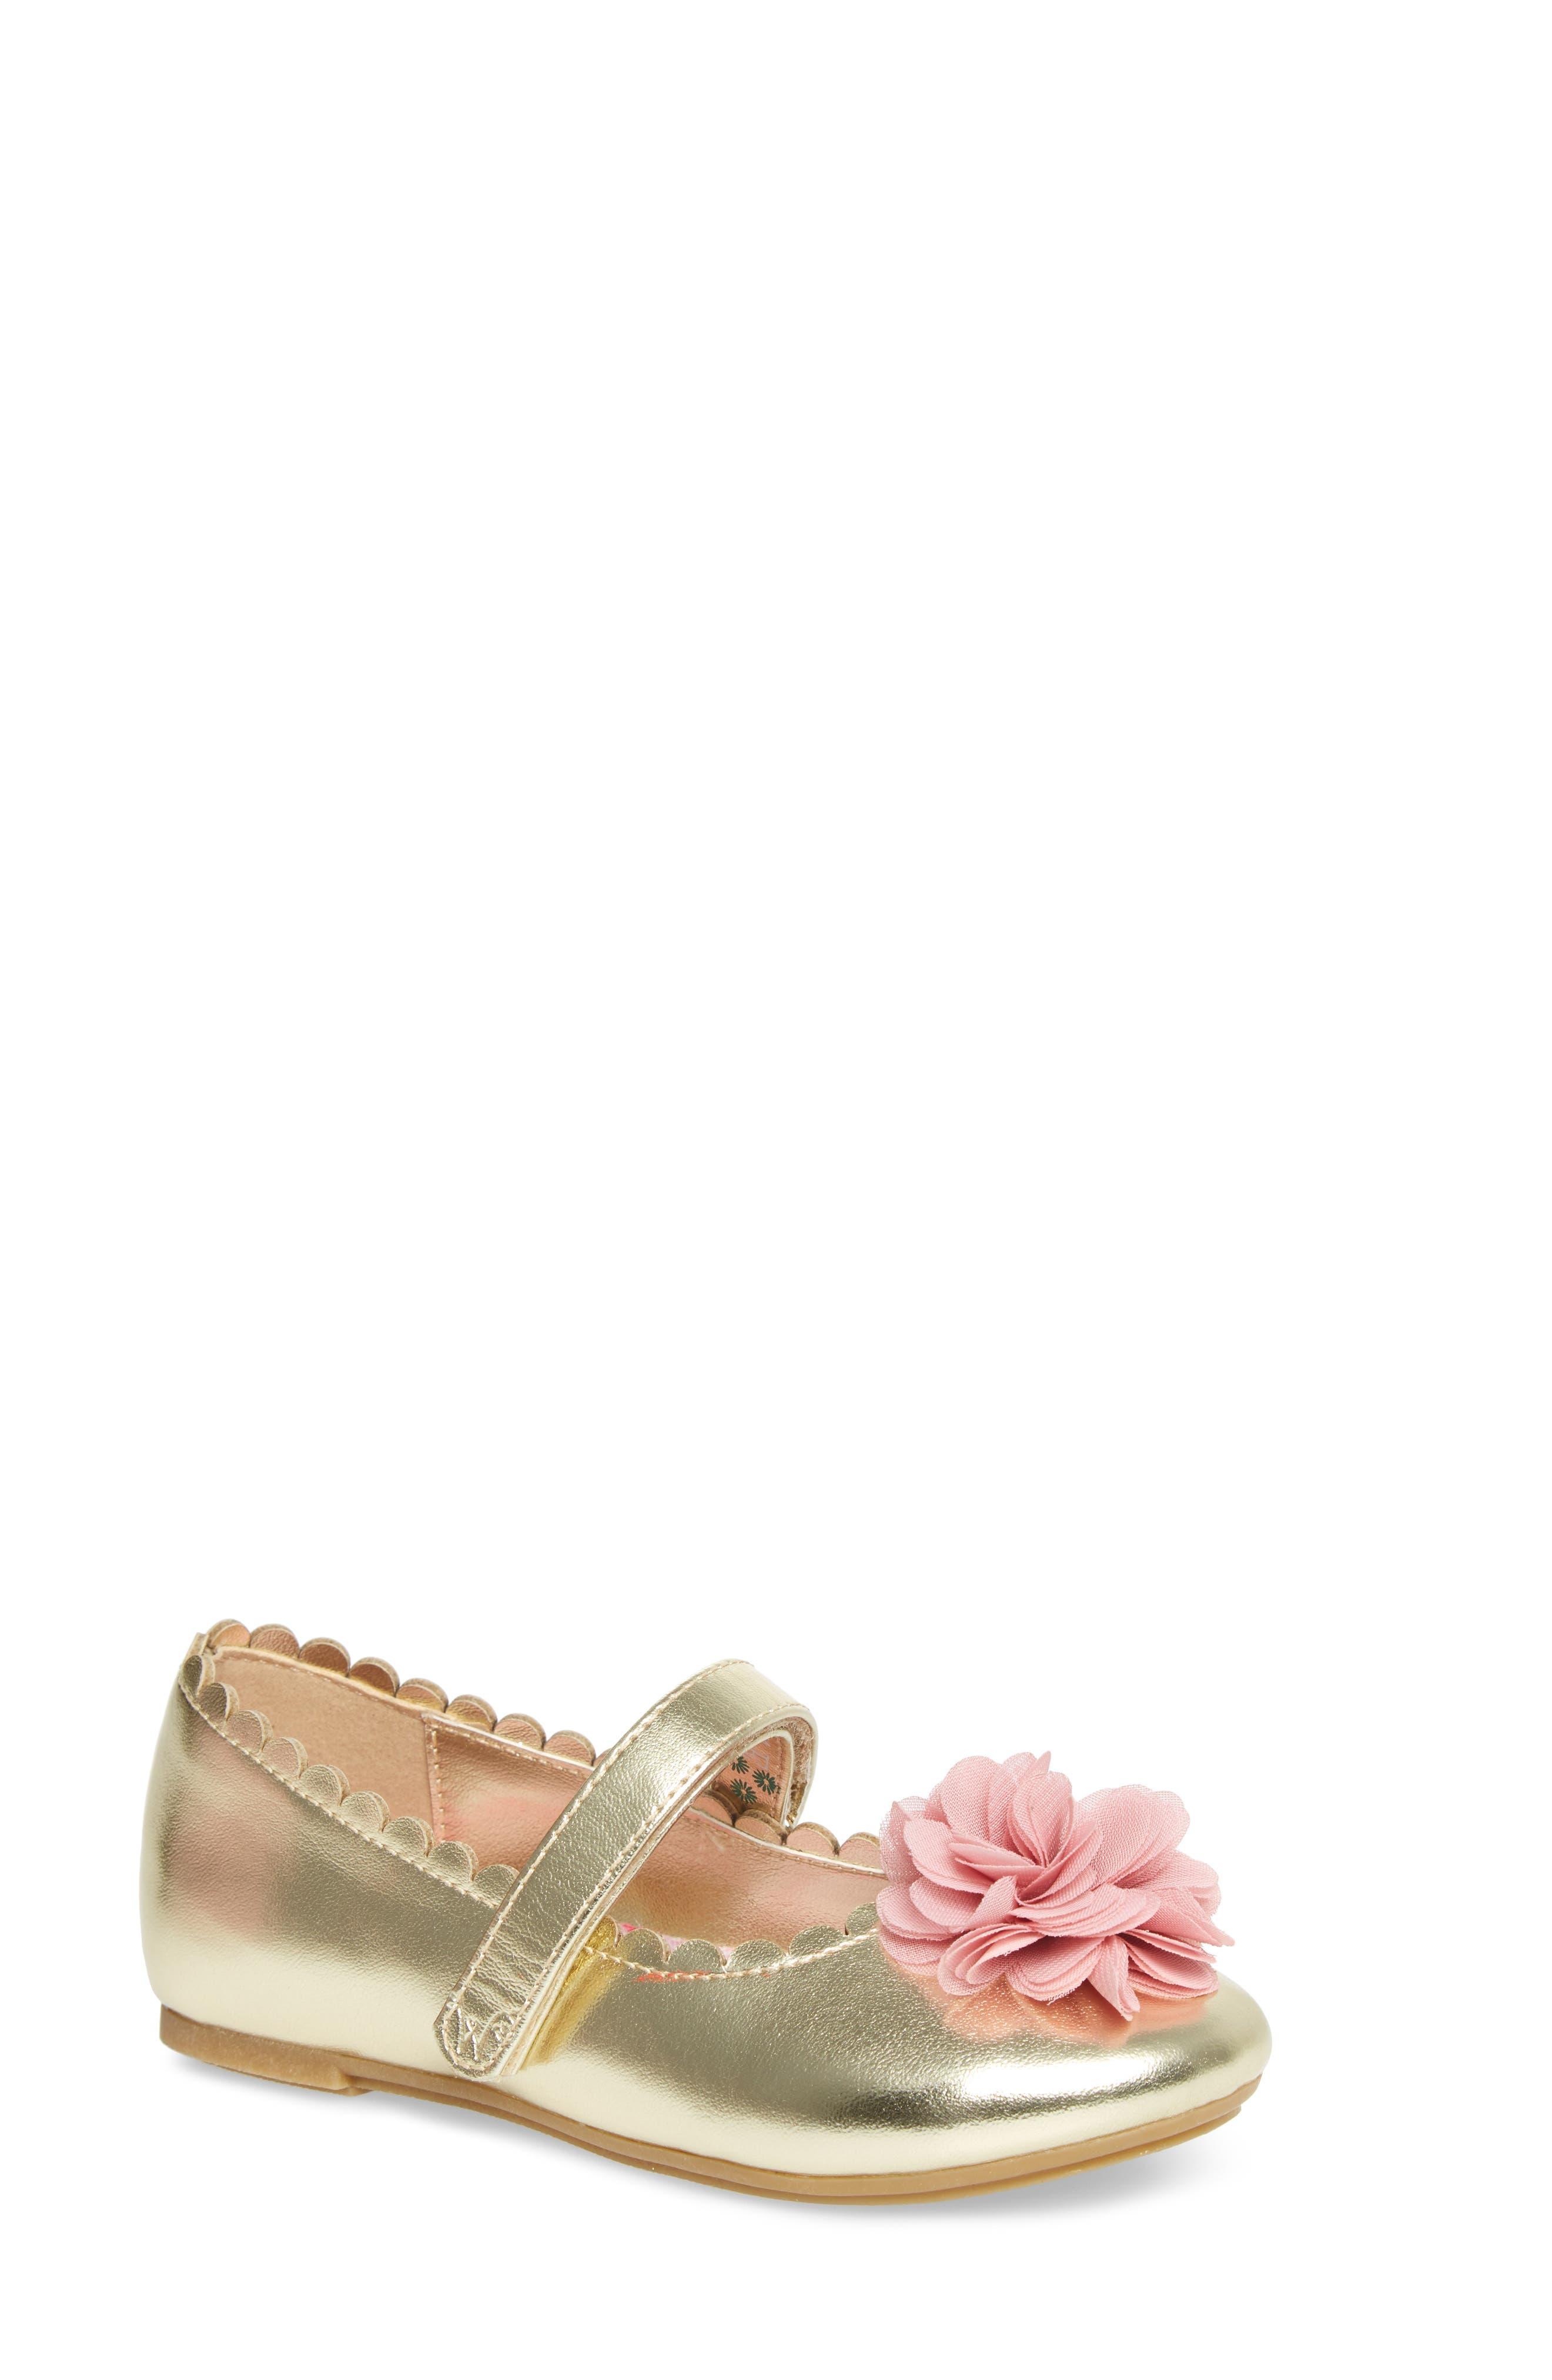 Alternate Image 1 Selected - WellieWishers from American Girl Ashlyn Flower Strap Ballet Flat (Walker & Toddler)